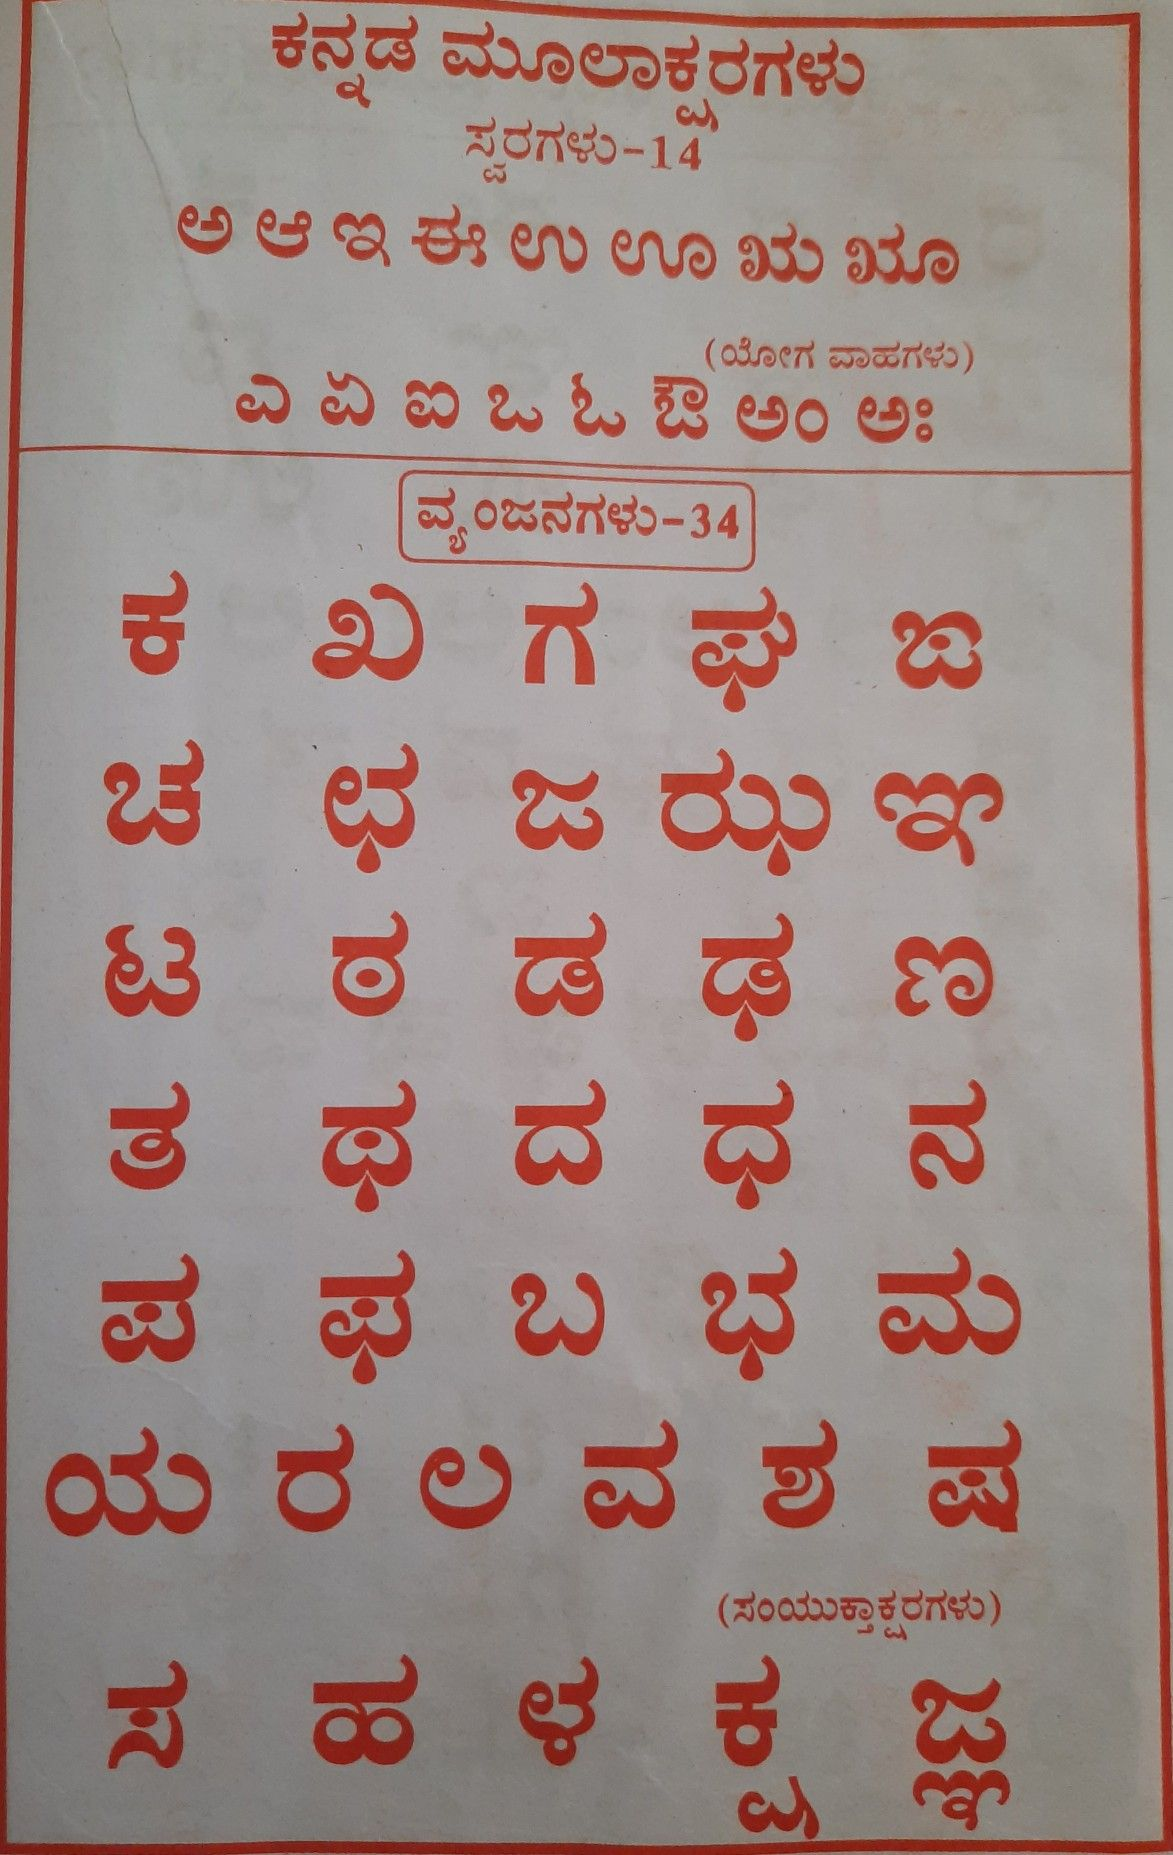 Kannada Alphabets Mulaksharagalu In 2021 Three Letter Words Language Worksheets Learning The Alphabet